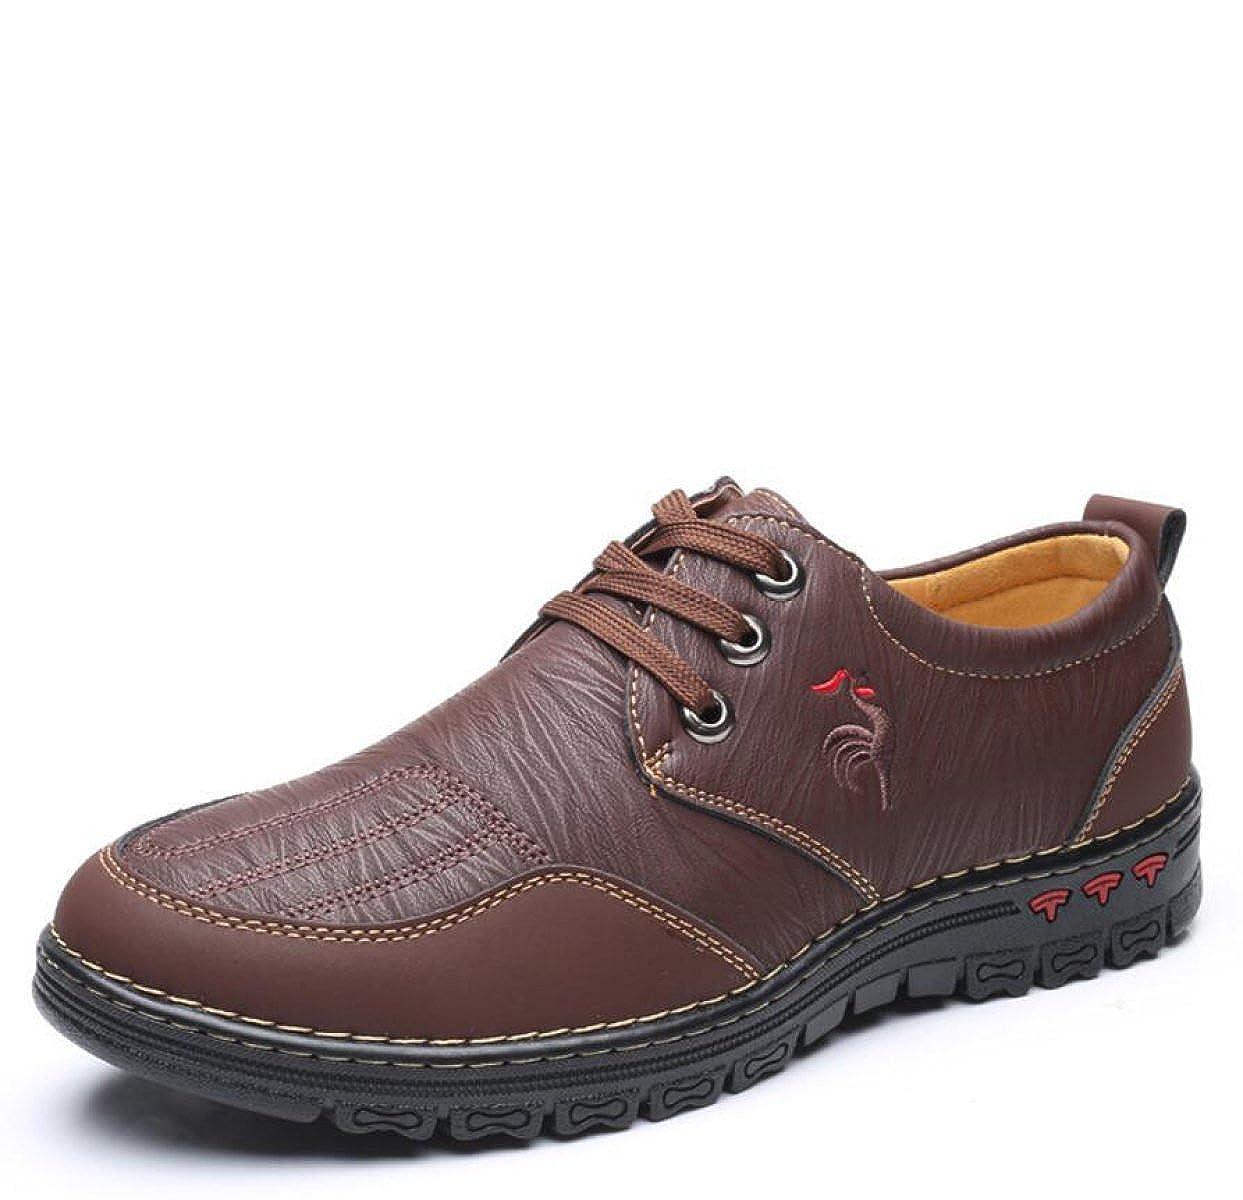 Herbst Schuhe Outdoor Freizeitschuhe Herrenschuhe Männer Hand Stich Wild Wanderschuhe Herrenschuhe Freizeitschuhe Braun 5d3cf9